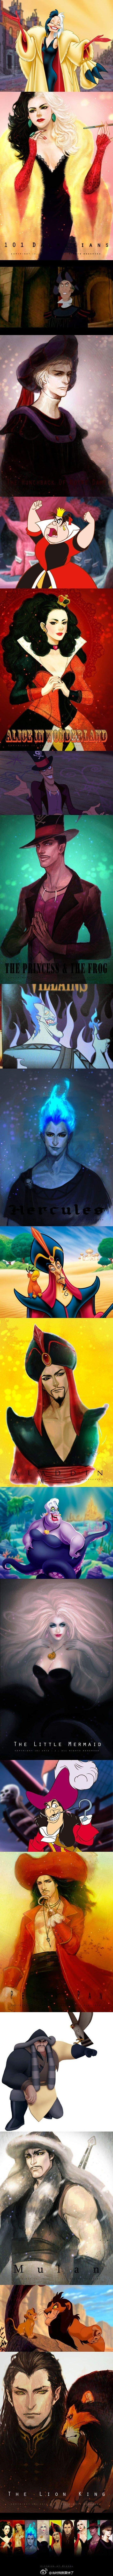 Disney's antagonists.